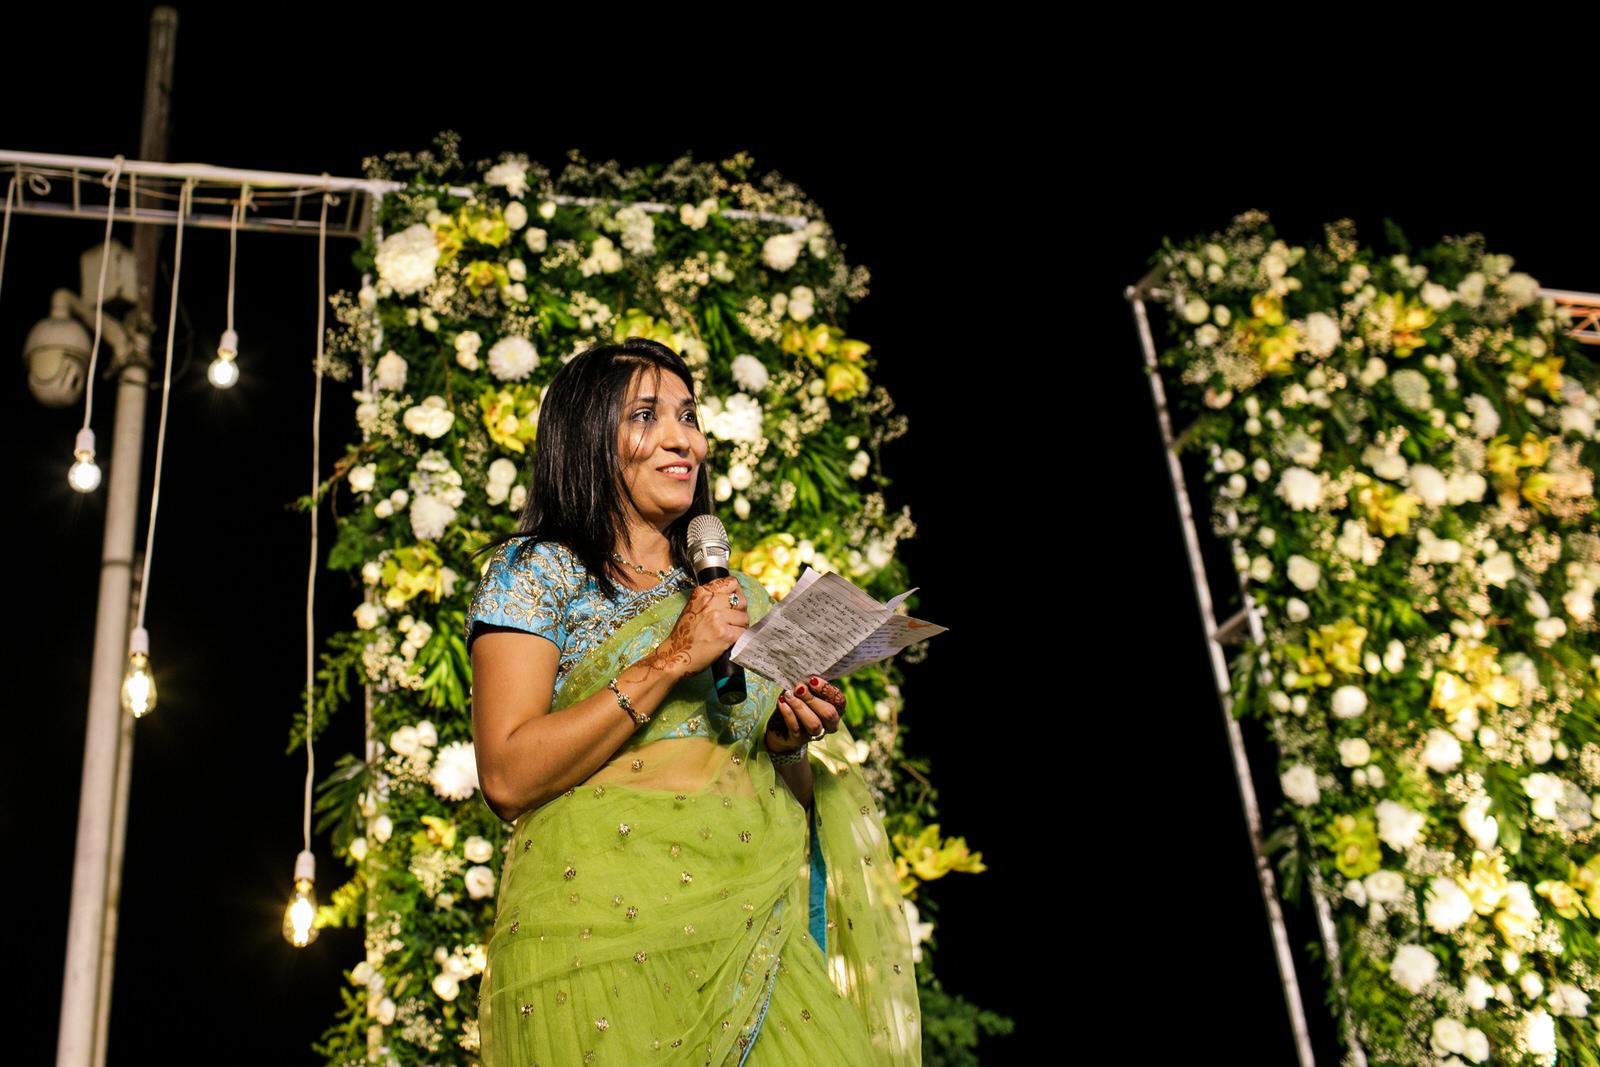 S&M_The Story_www.samandekta.com-107-1.jpg